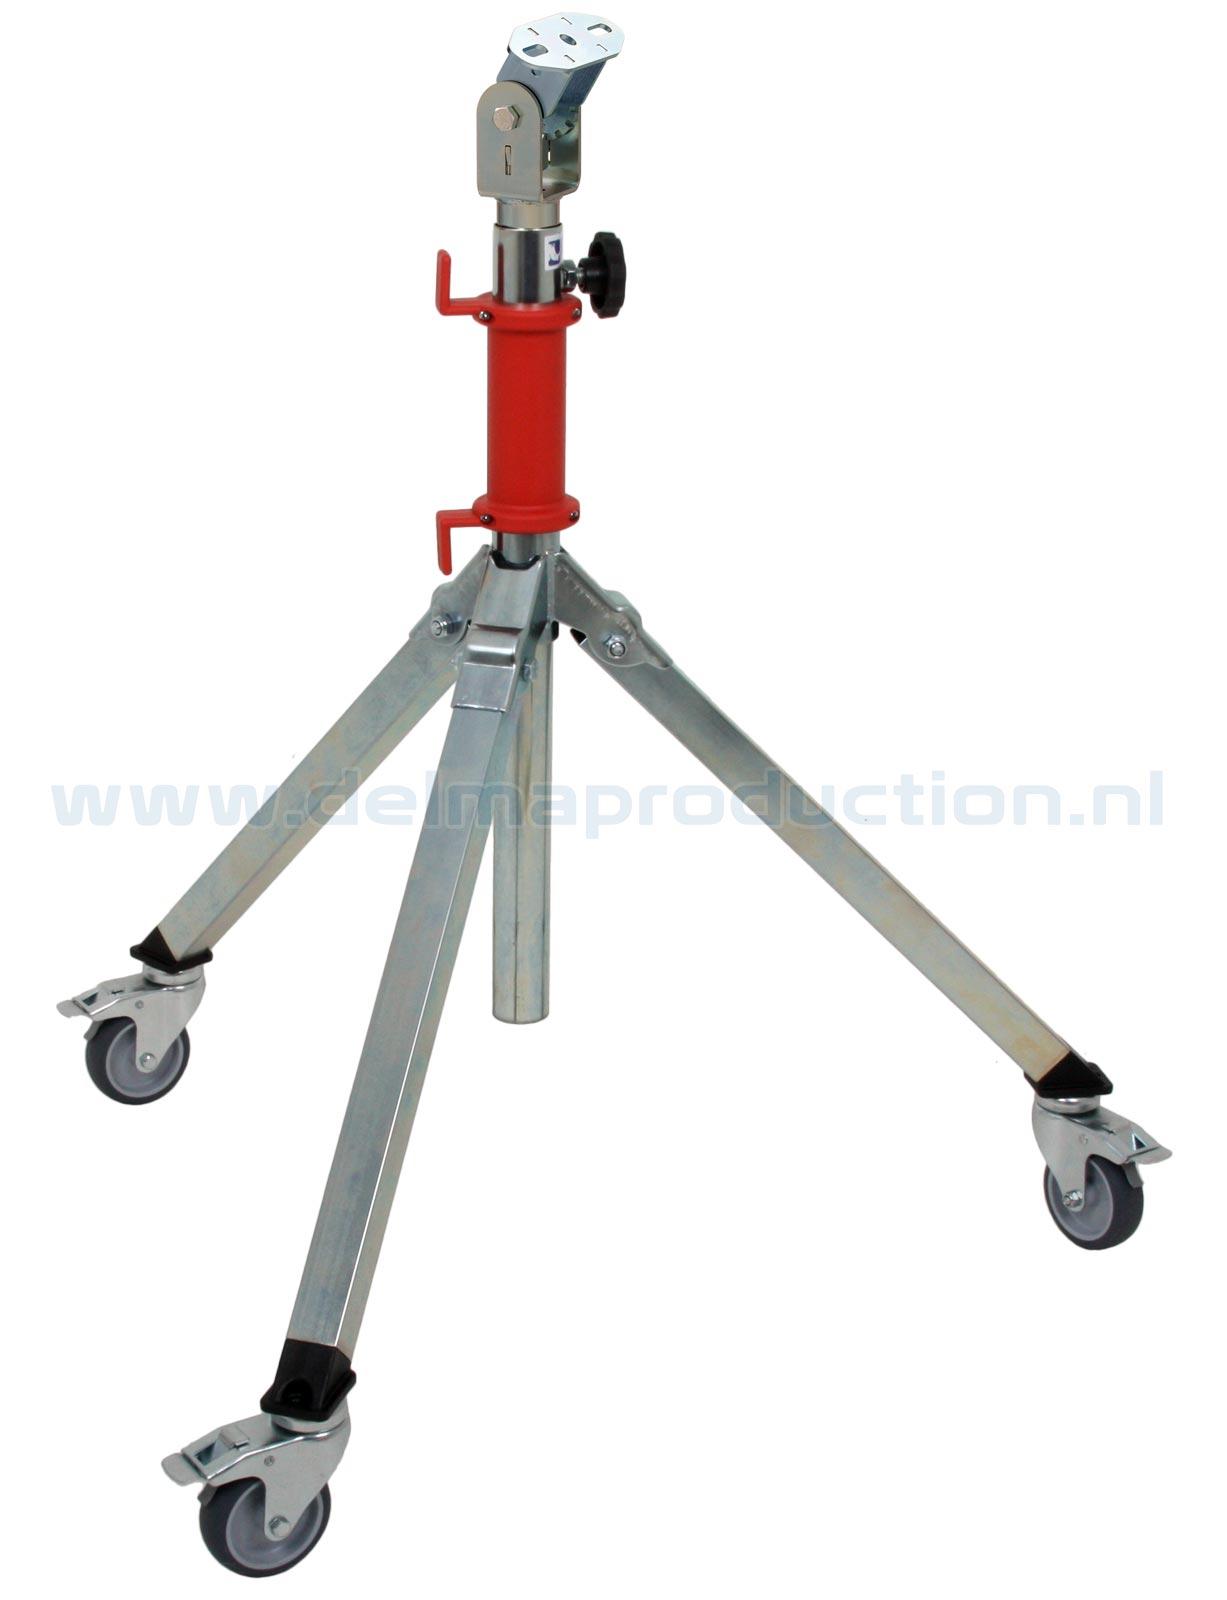 Tripod worklight stand 2-part Midi, mobile, quick adjustment